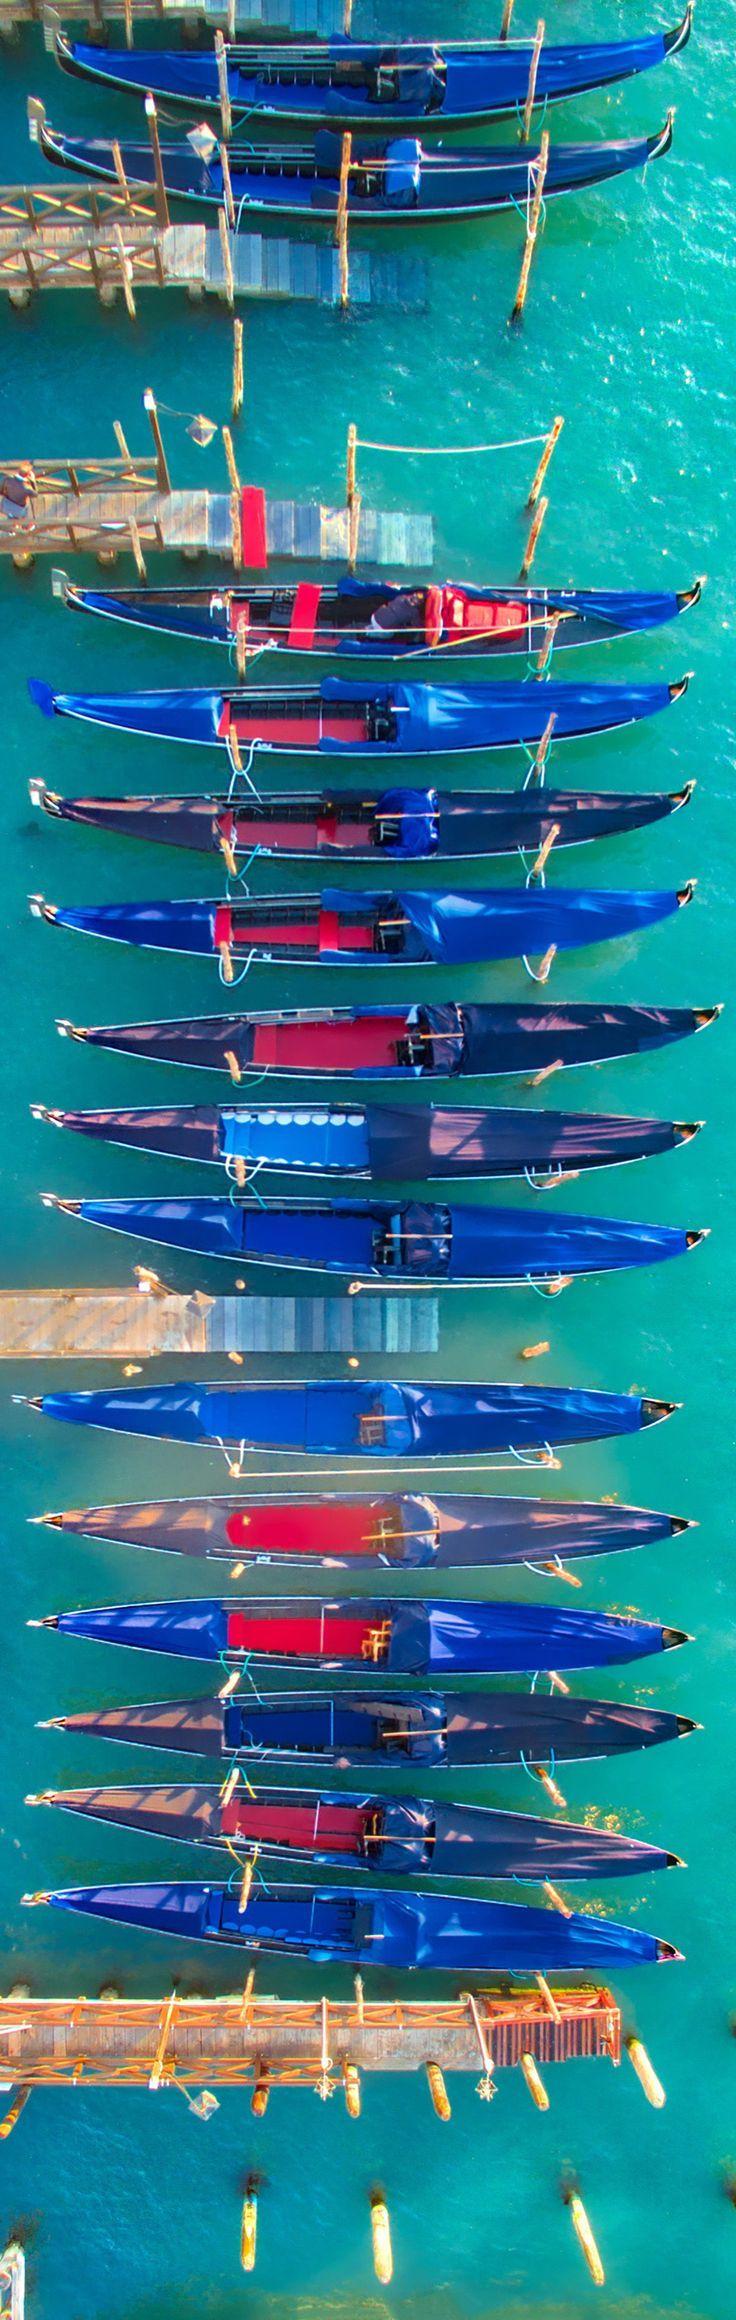 Beautiful Venice and gondolas from above. #Venice #Gondola #Italy ⛵ Marynistyka.org, ⛵ Marynistyka.pl, ⚓ Marynistyka.waw.pl ⚓ Sklep.marynistyka... ⚓